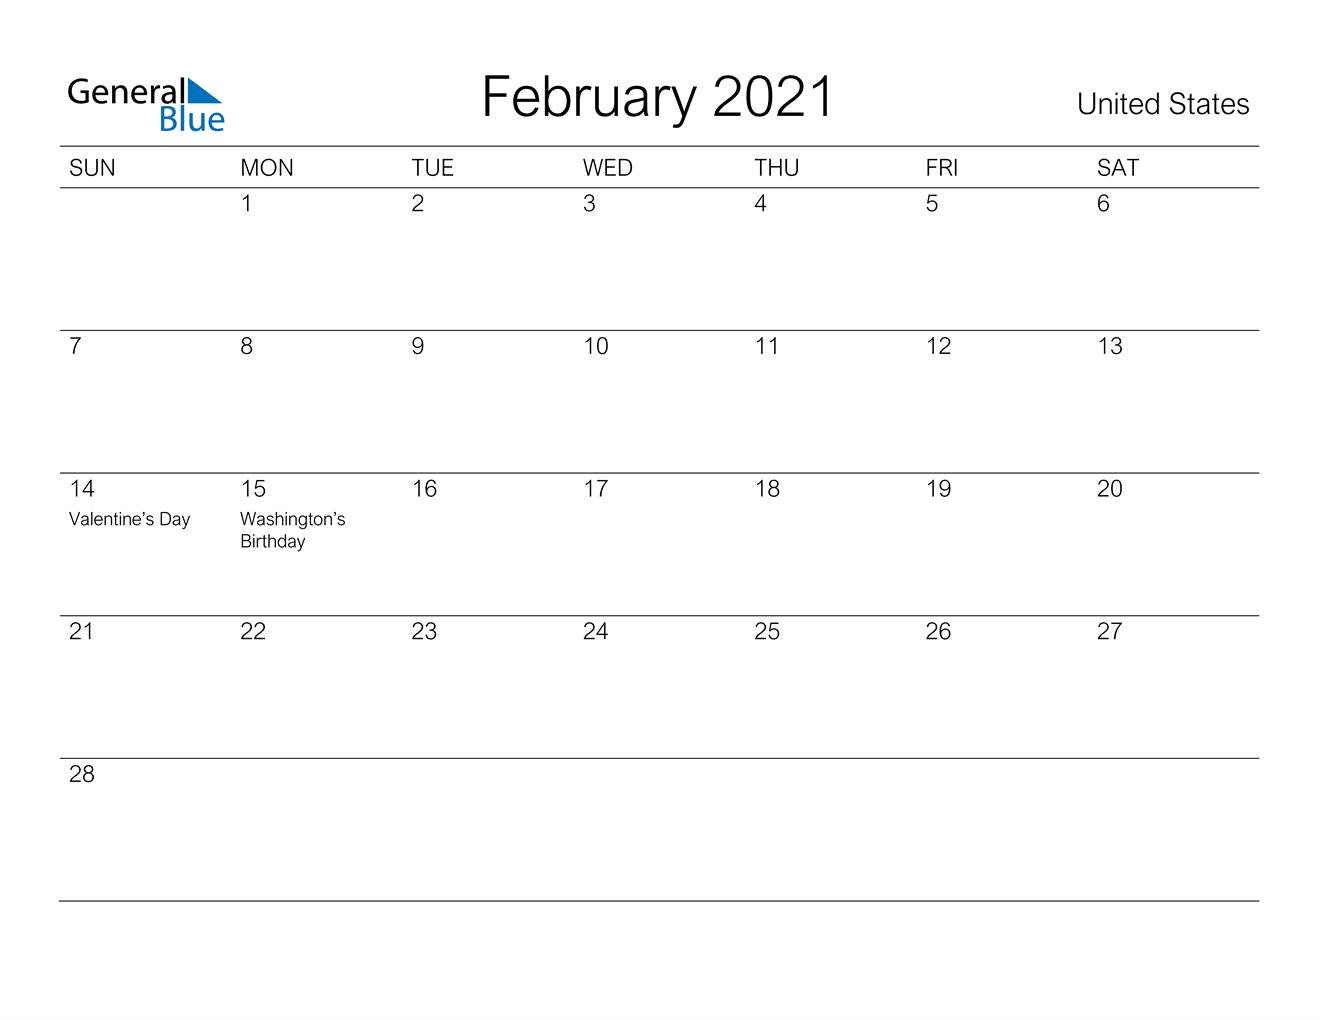 February 2021 Calendar - United States